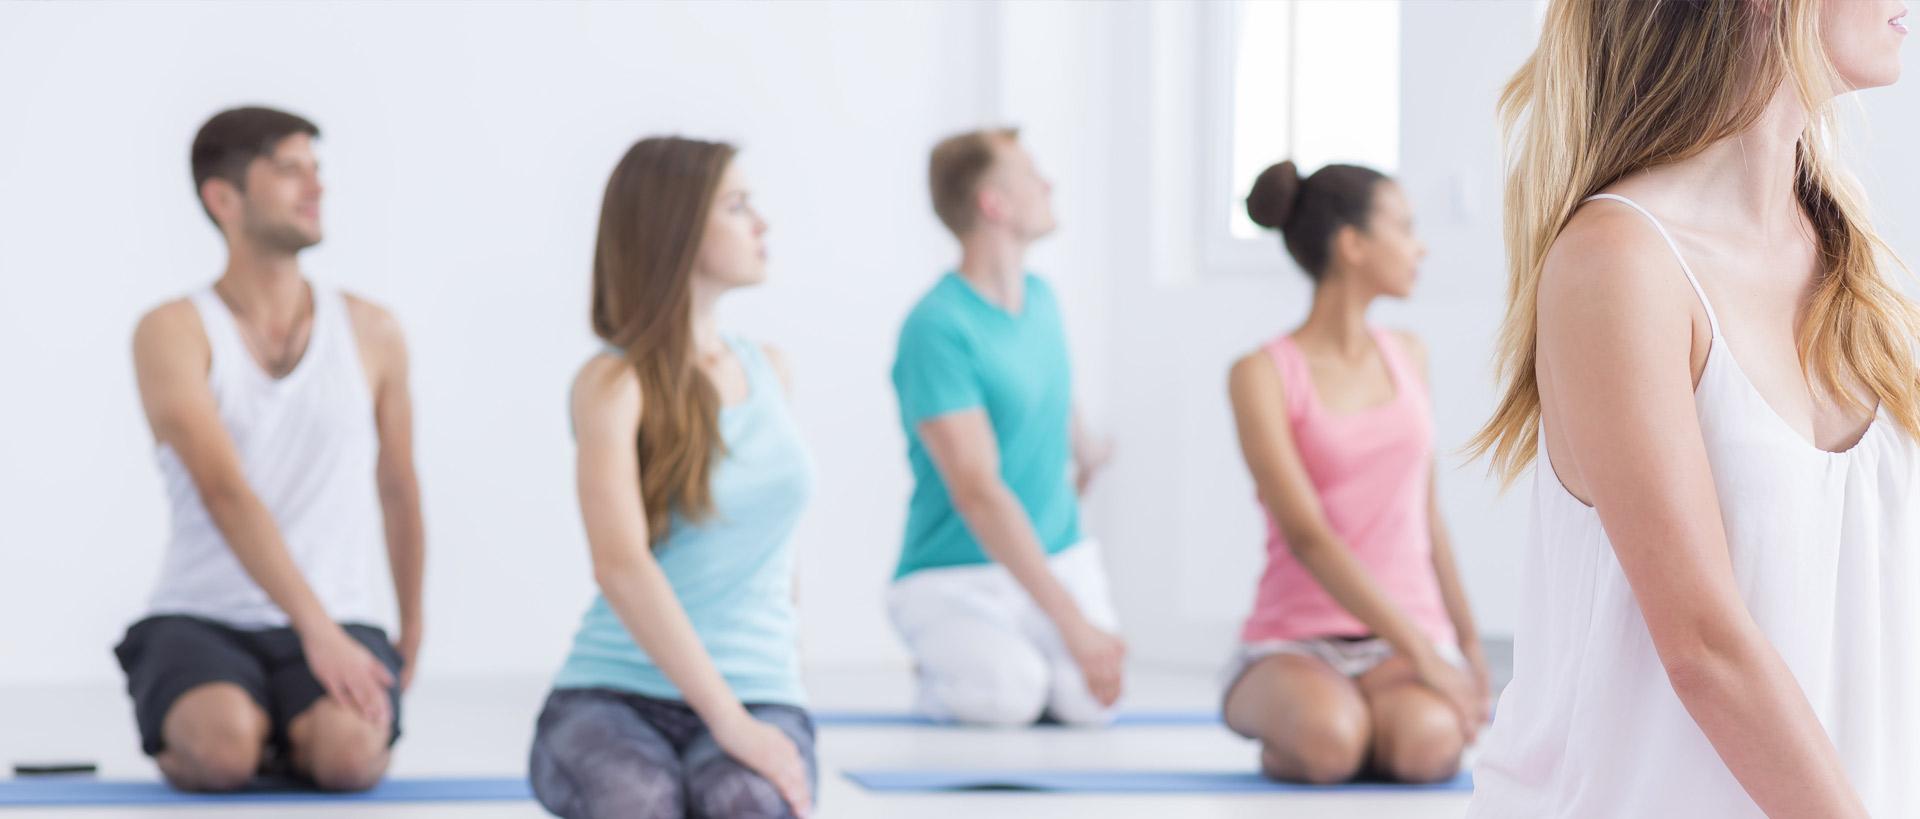 Yogatorsie, Yogacentrum Eemland